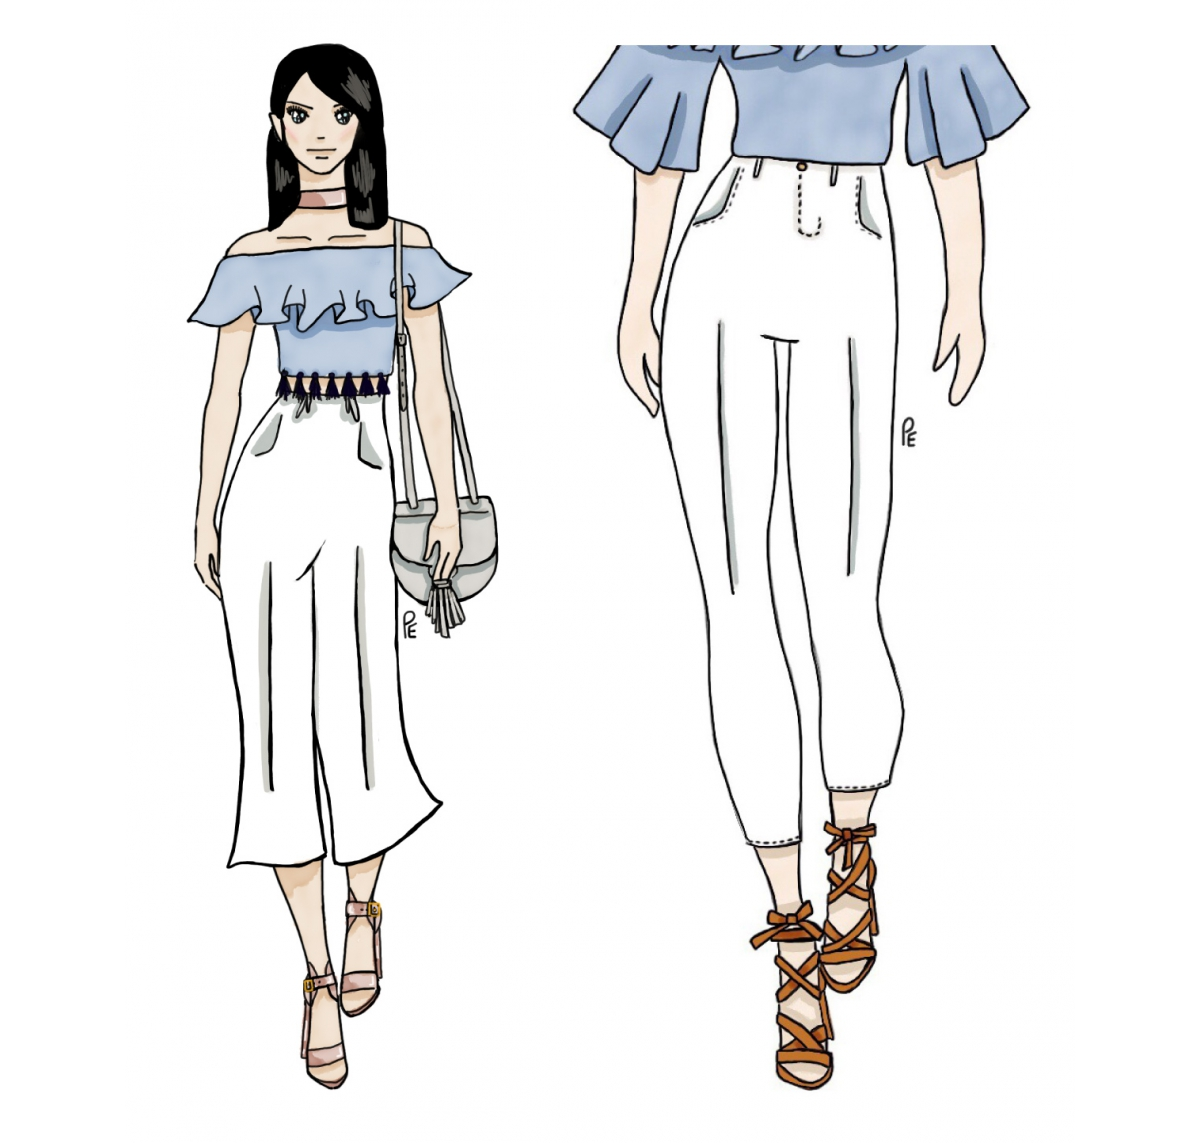 Betts Shoes Illustration